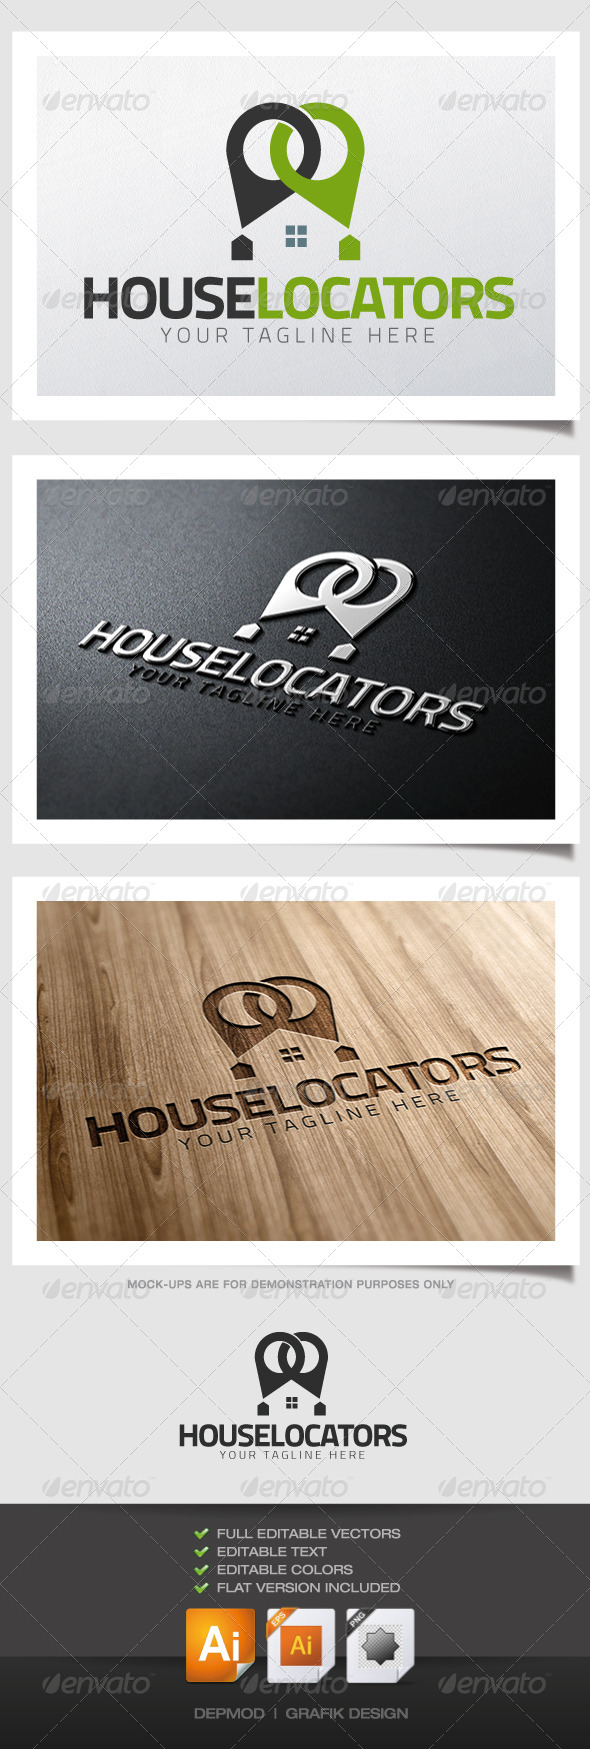 GraphicRiver House Locators Logo 4621864